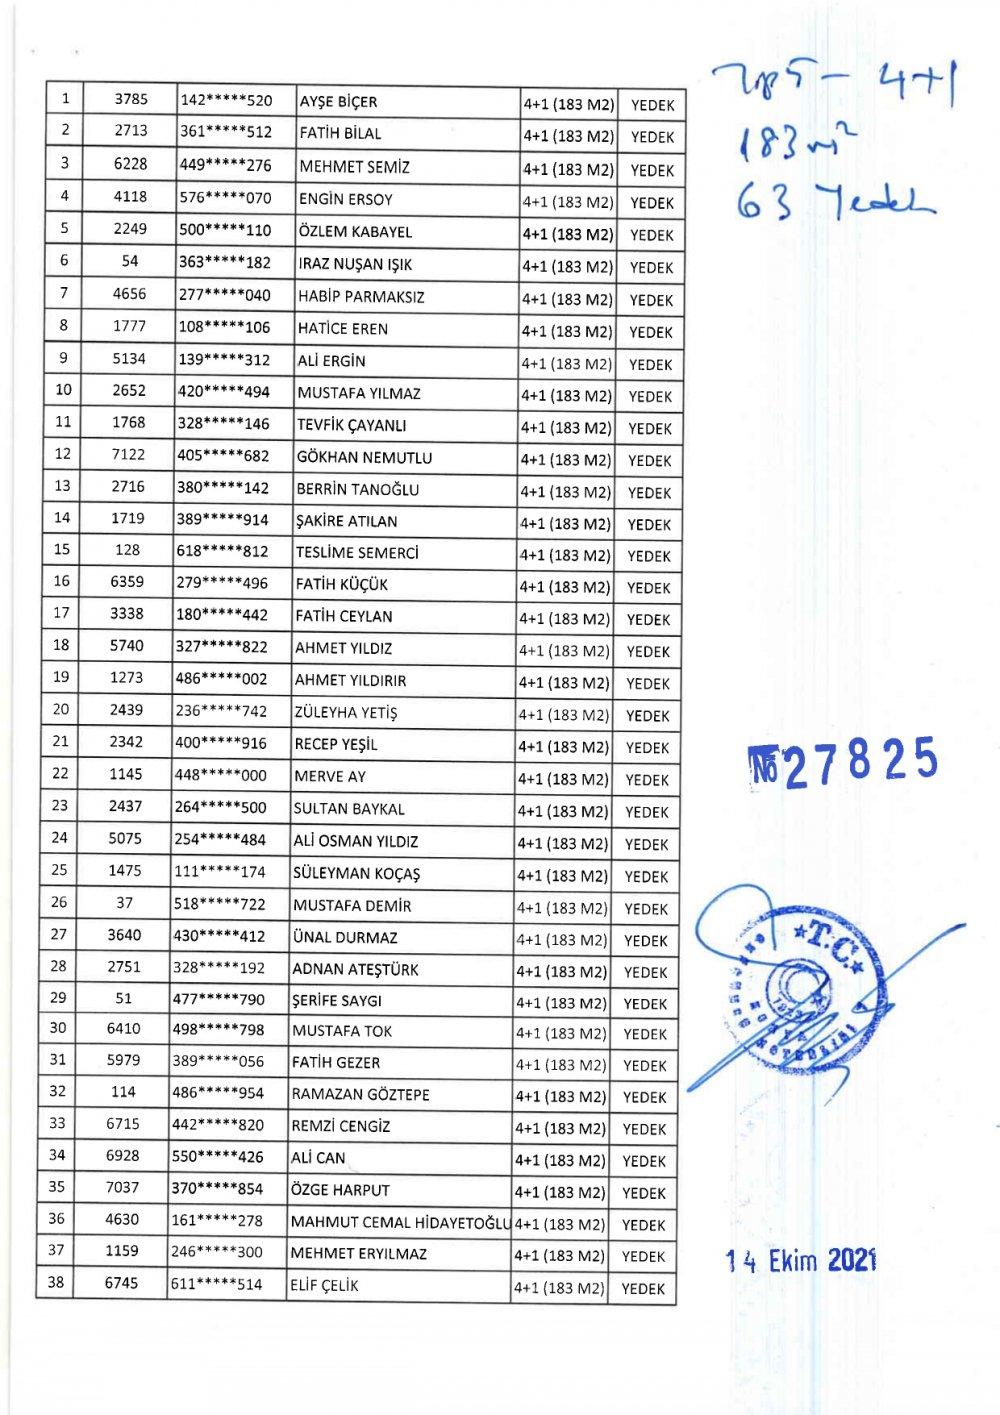 ss-turgutreis-evleri-kyk-kura-cekilis-listesi-page-0021.jpg